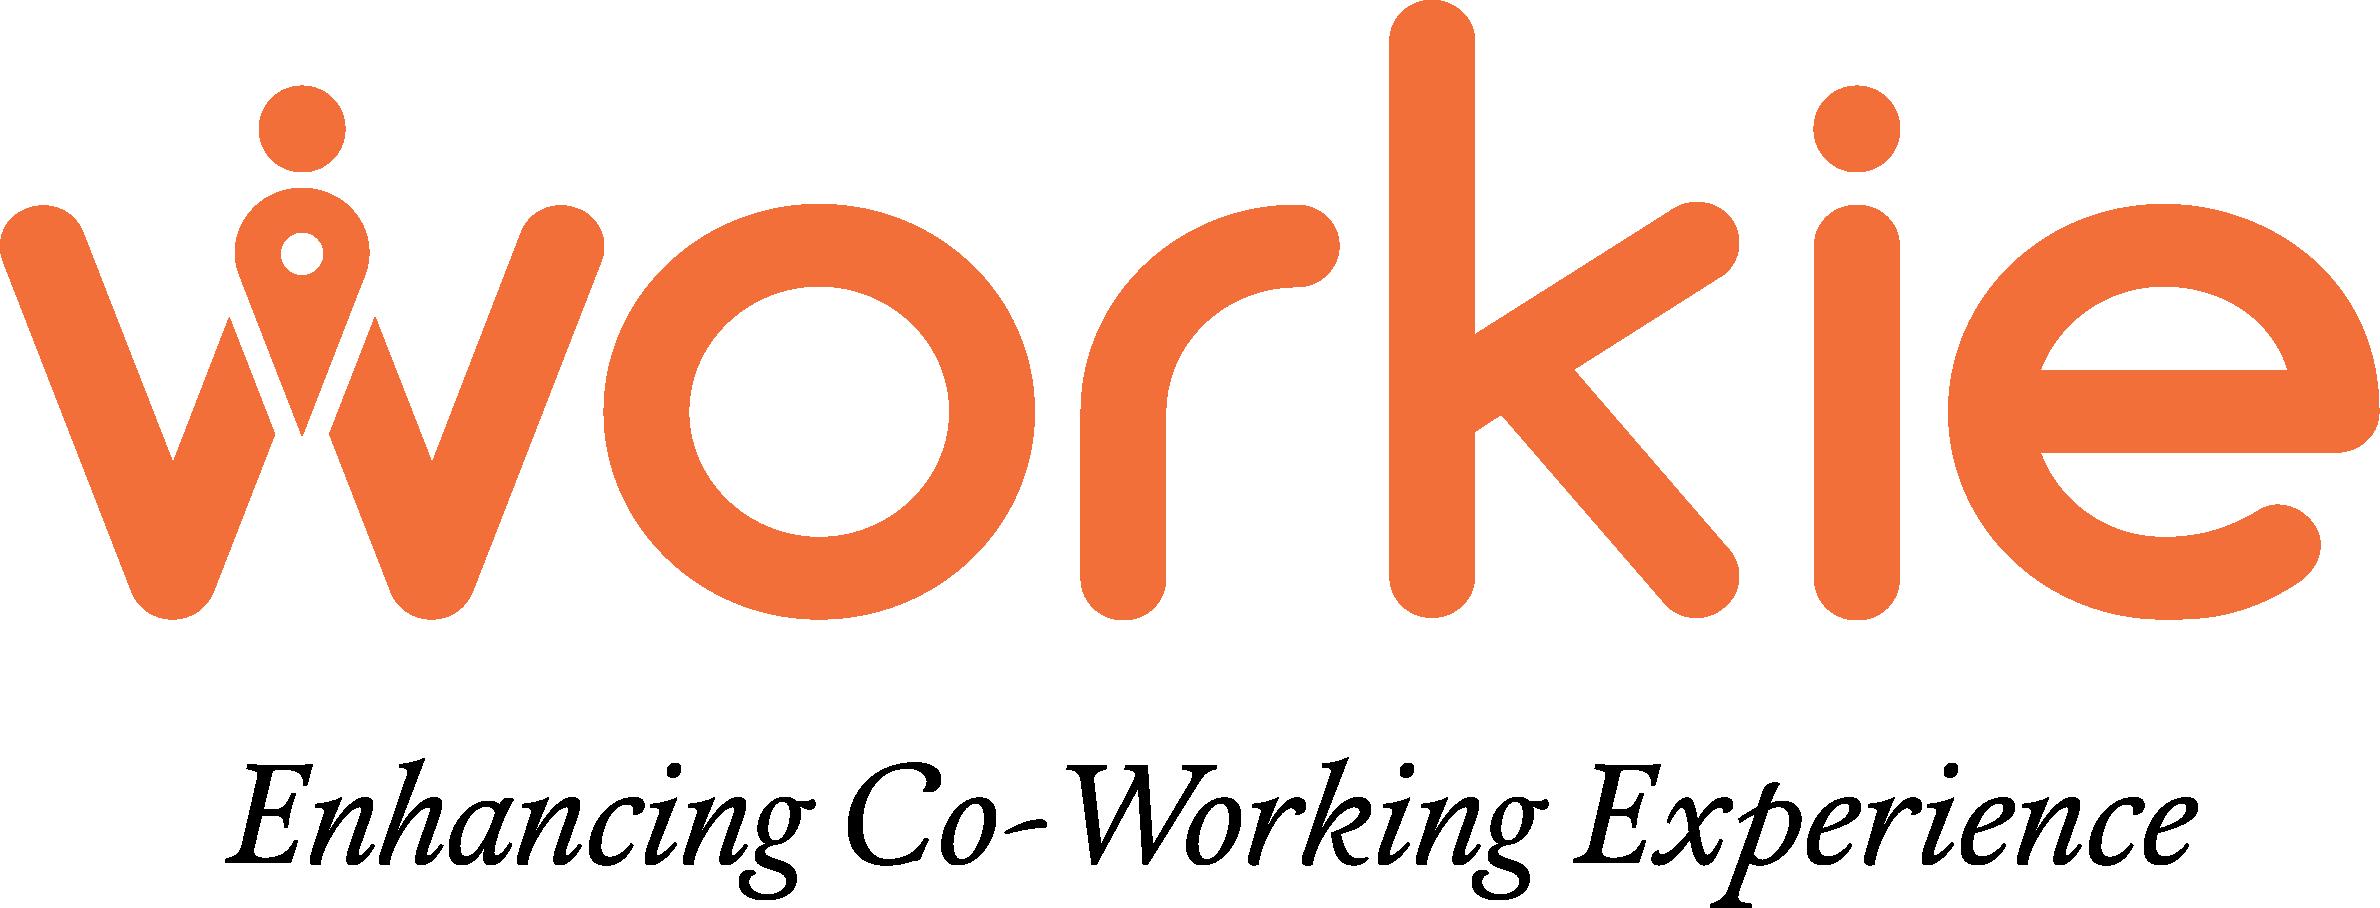 Workie 3.0, Indore